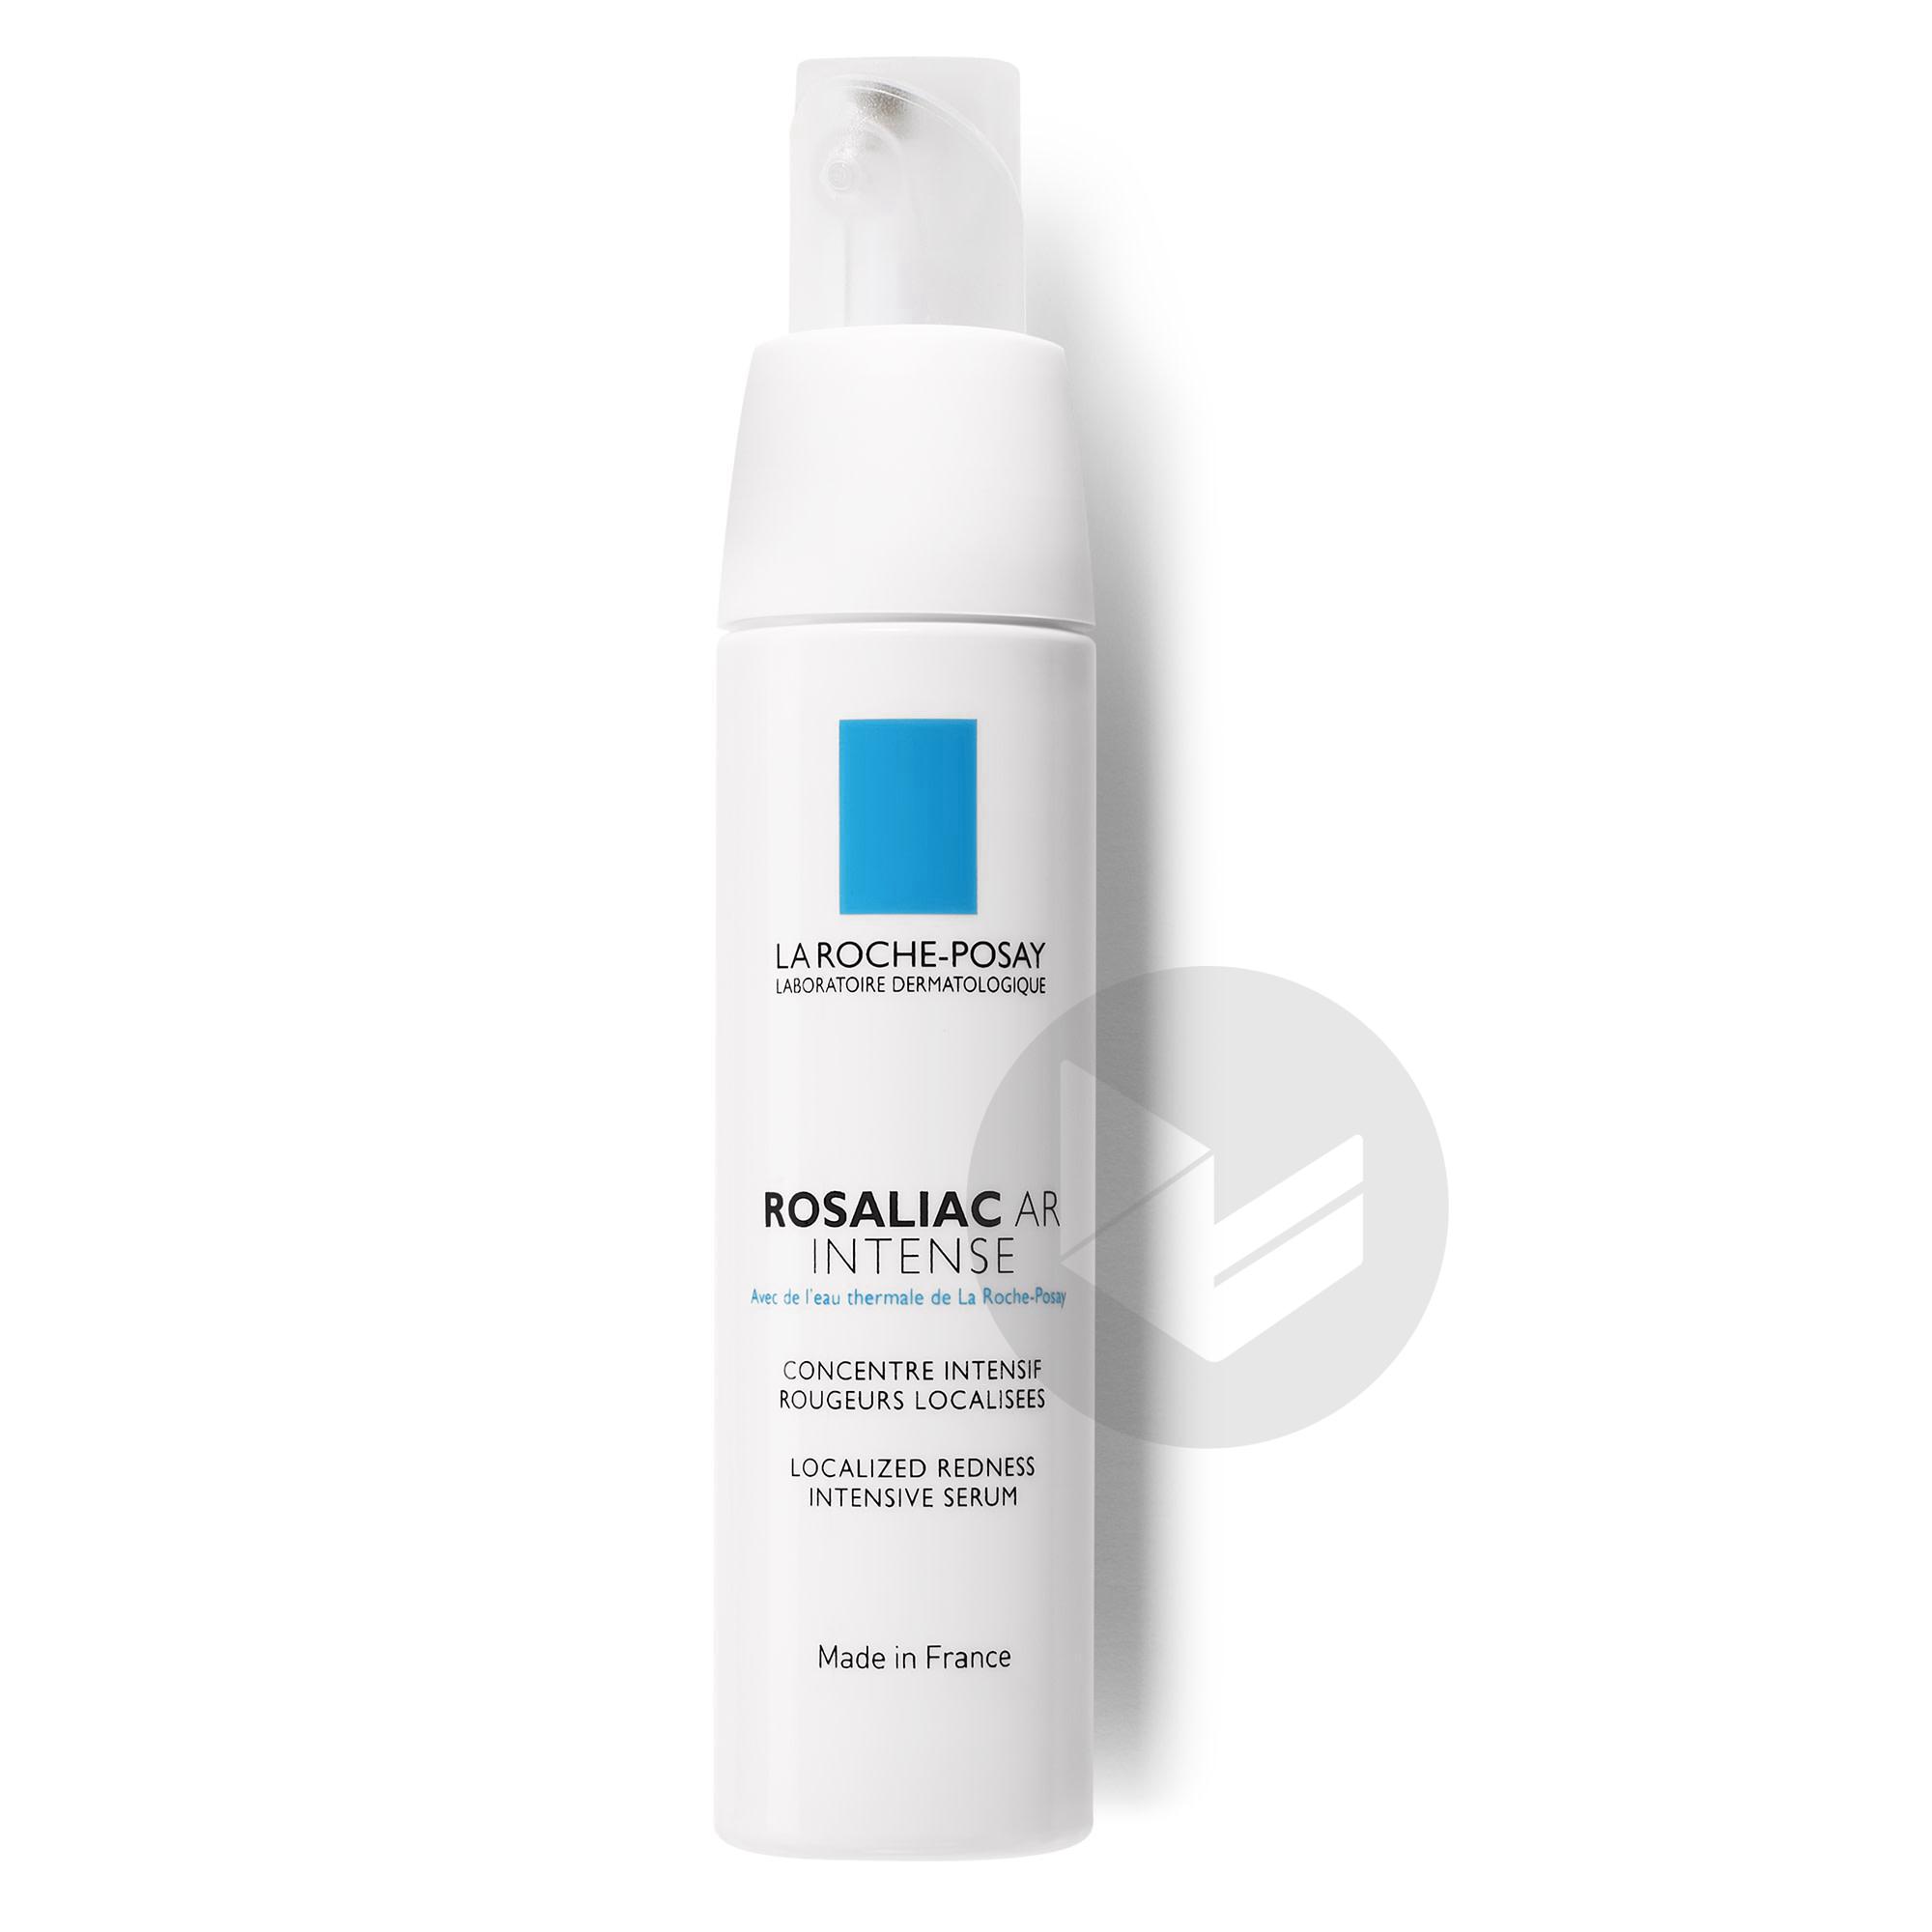 Rosaliac Concentre Intensif Anti Rougeurs 40 Ml